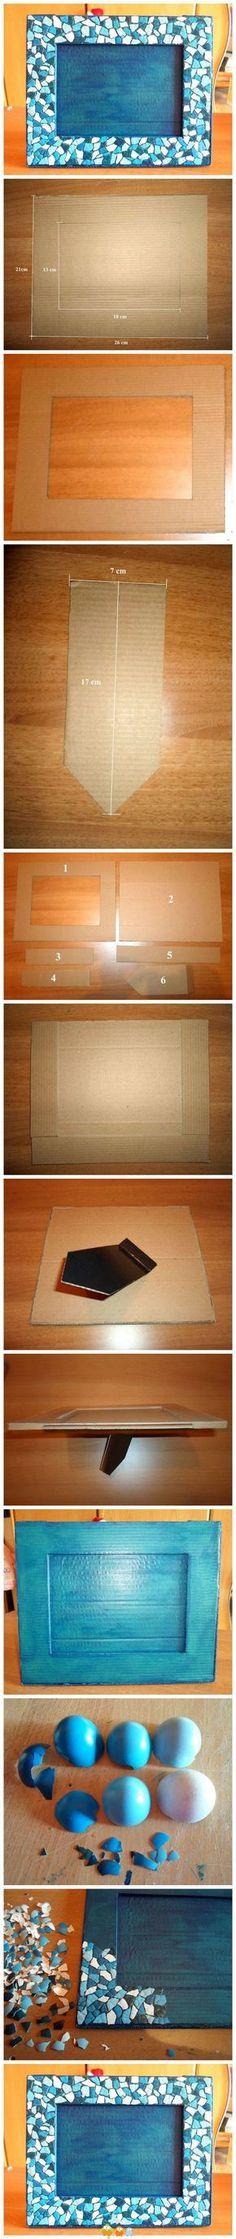 Bilderrahmen aus Pappe selber bauen